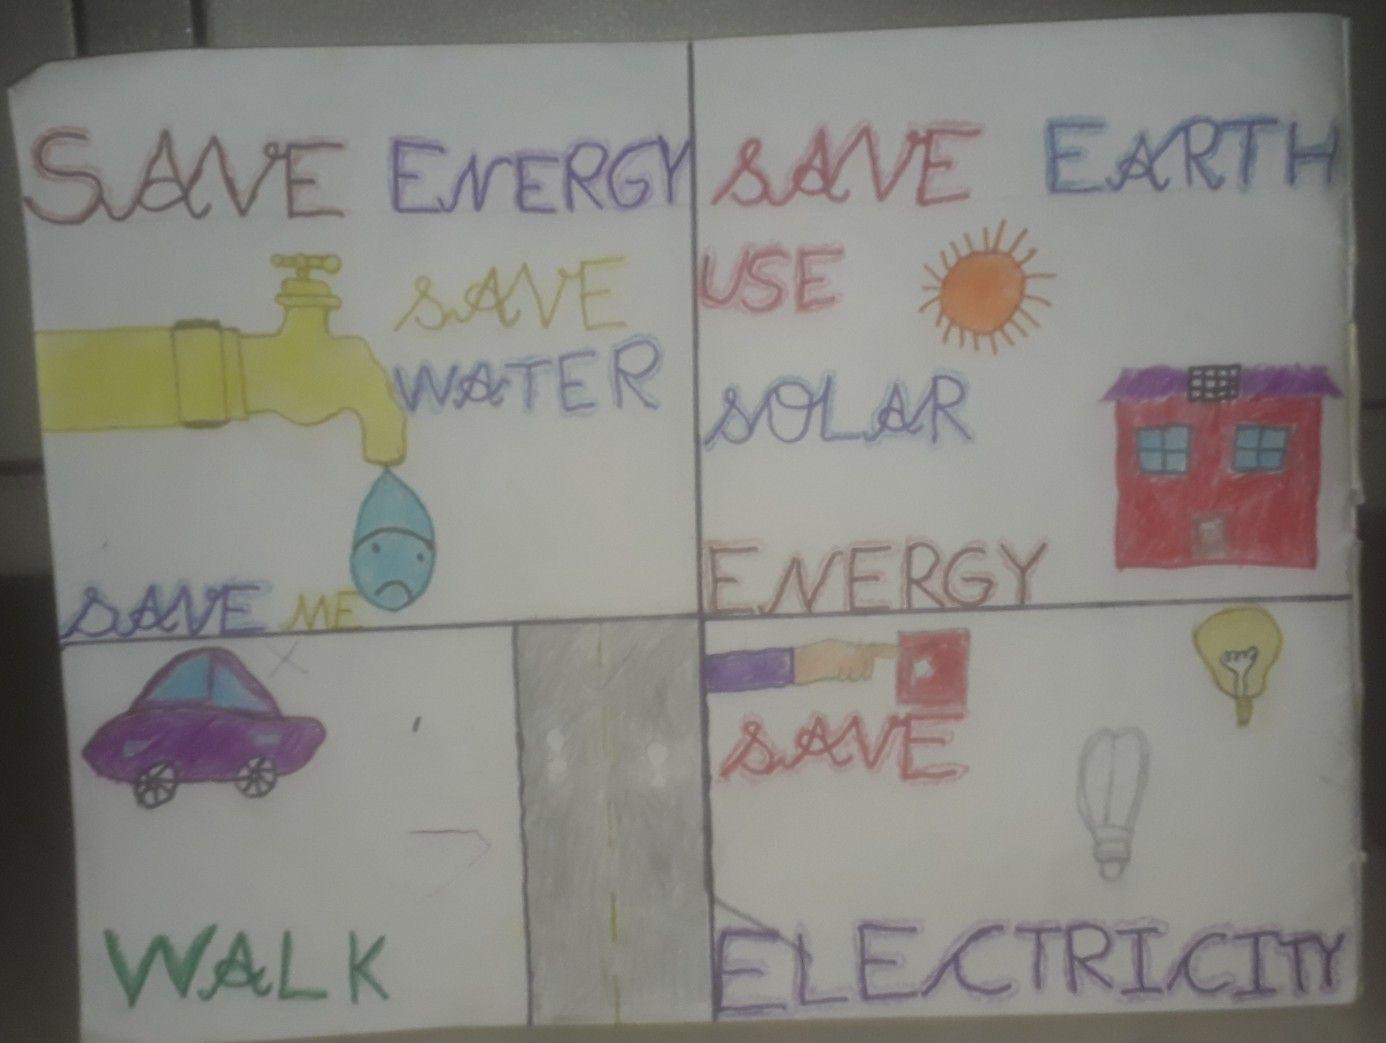 Save Energy Save Earth Drawing